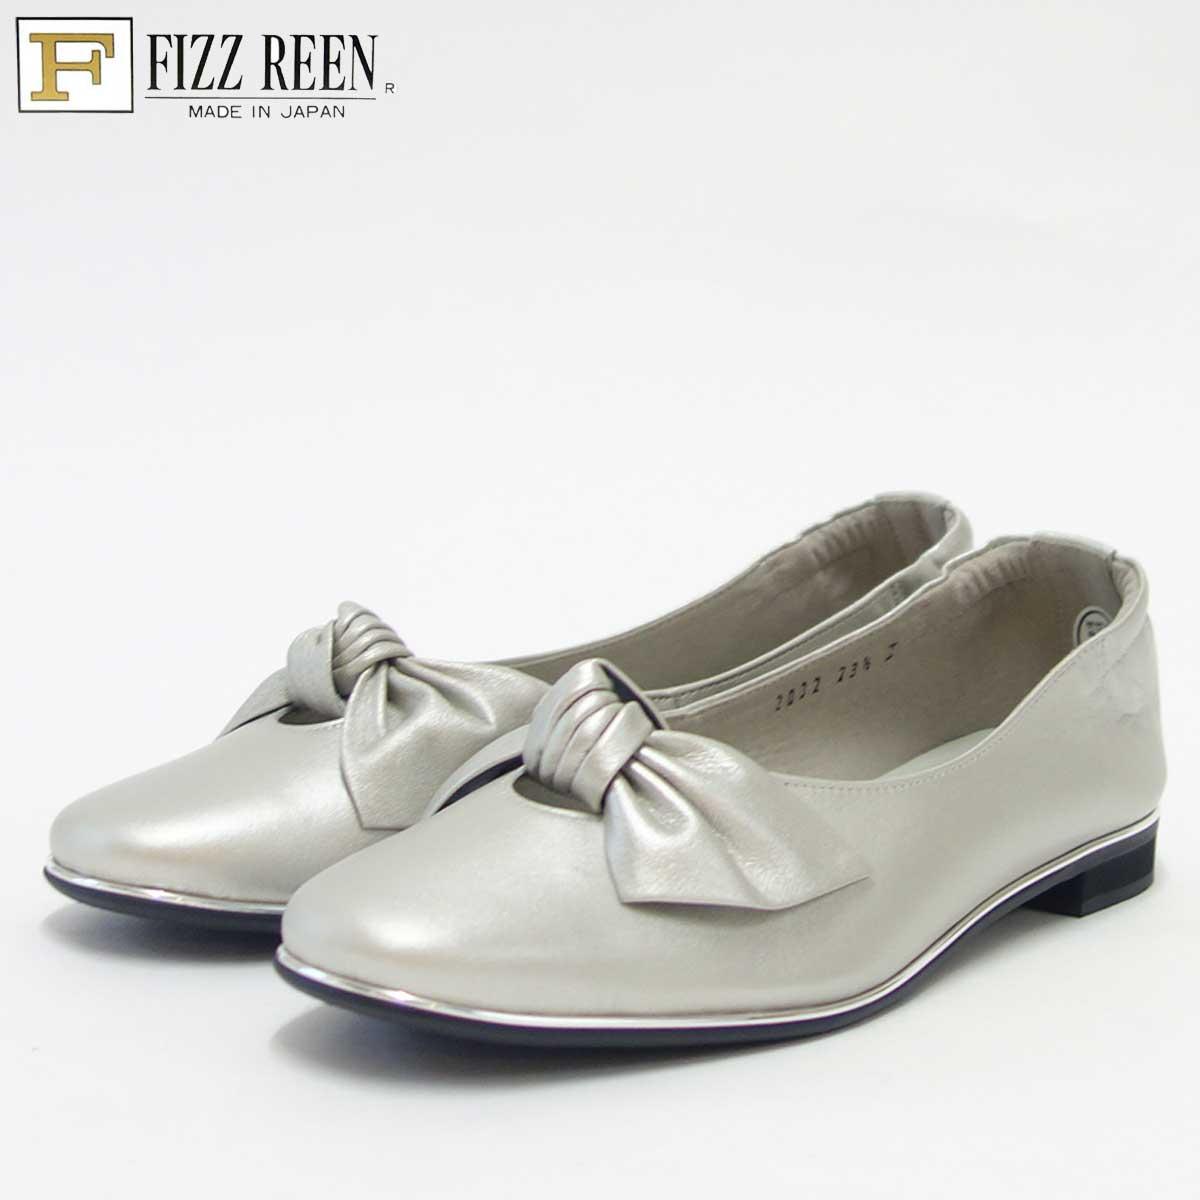 FIZZ REEN フィズリーン 2032 シルバー(レディース)快適EEEのバレエシューズ(日本製)「靴」 母の日 おすすめ ギフト